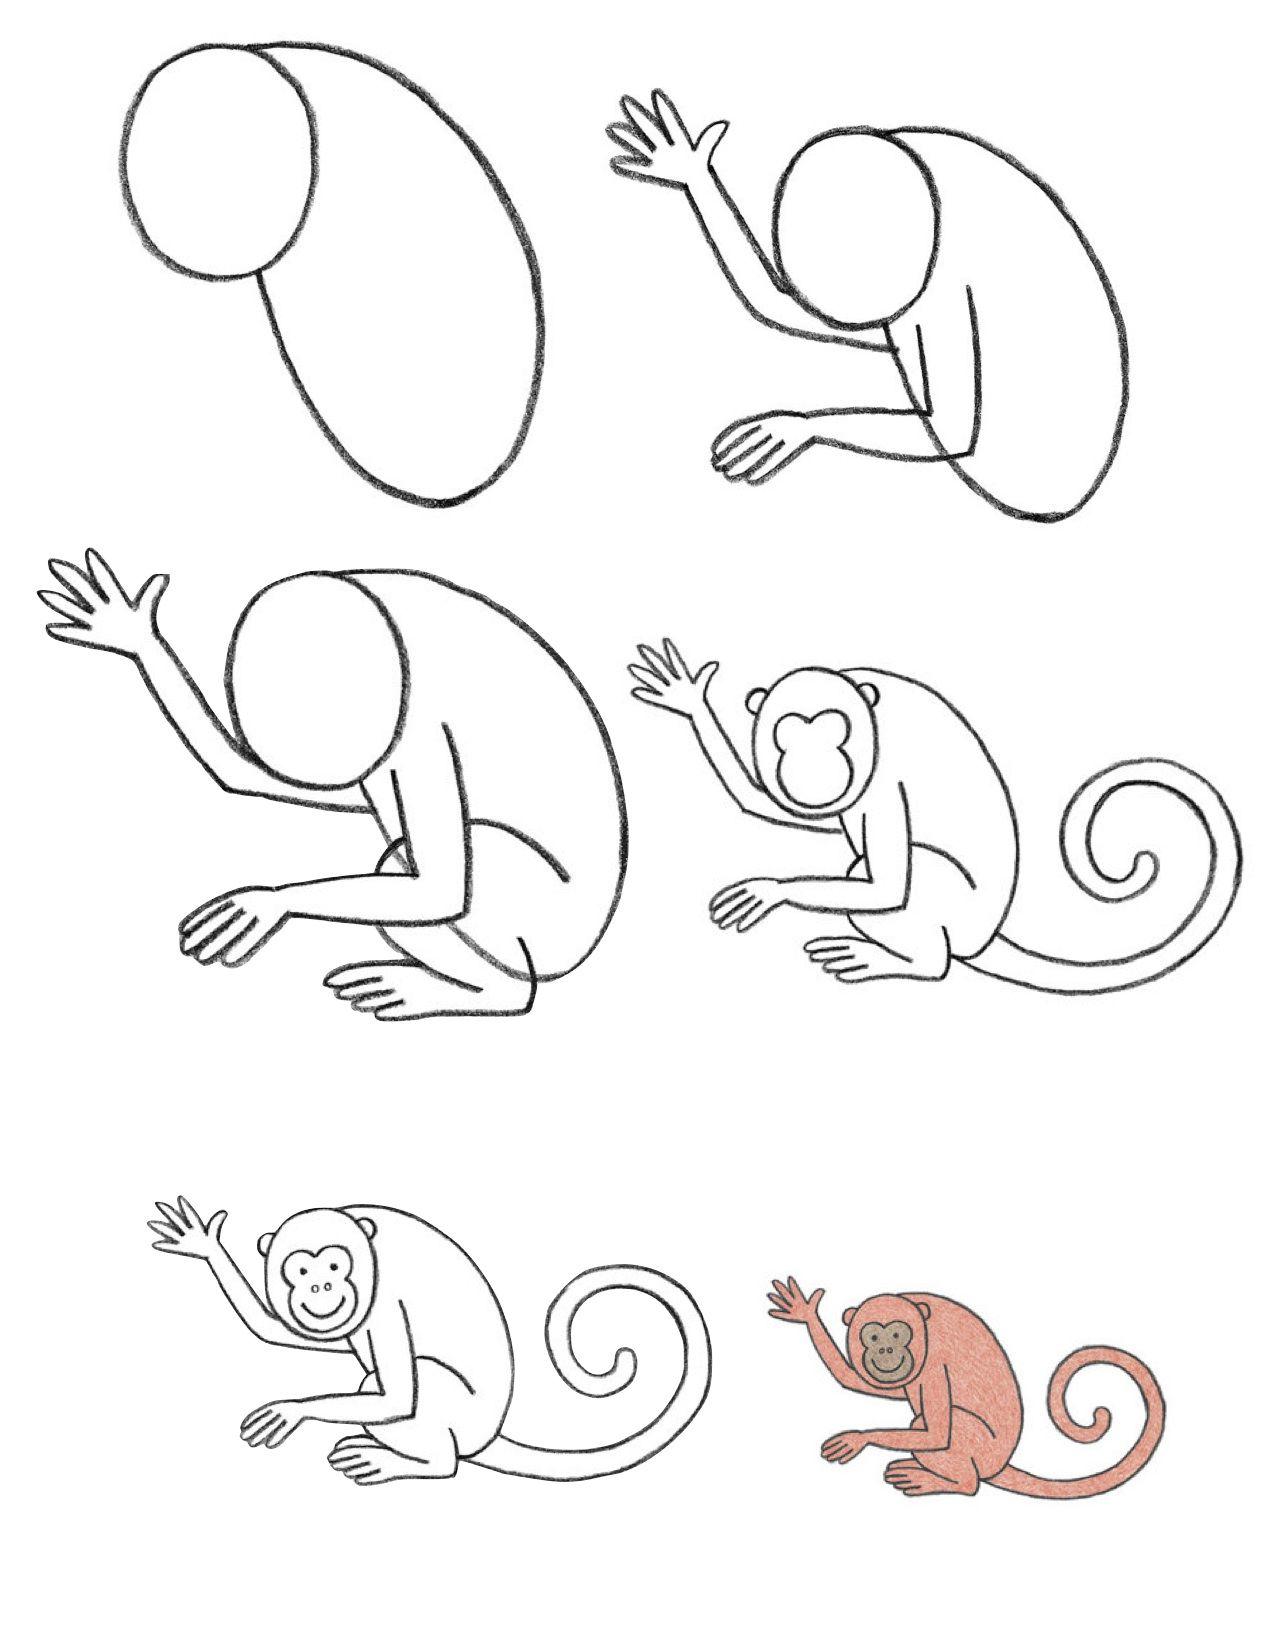 Aprender a dibujar fácilmente un mono. - easly learn to draw a ...